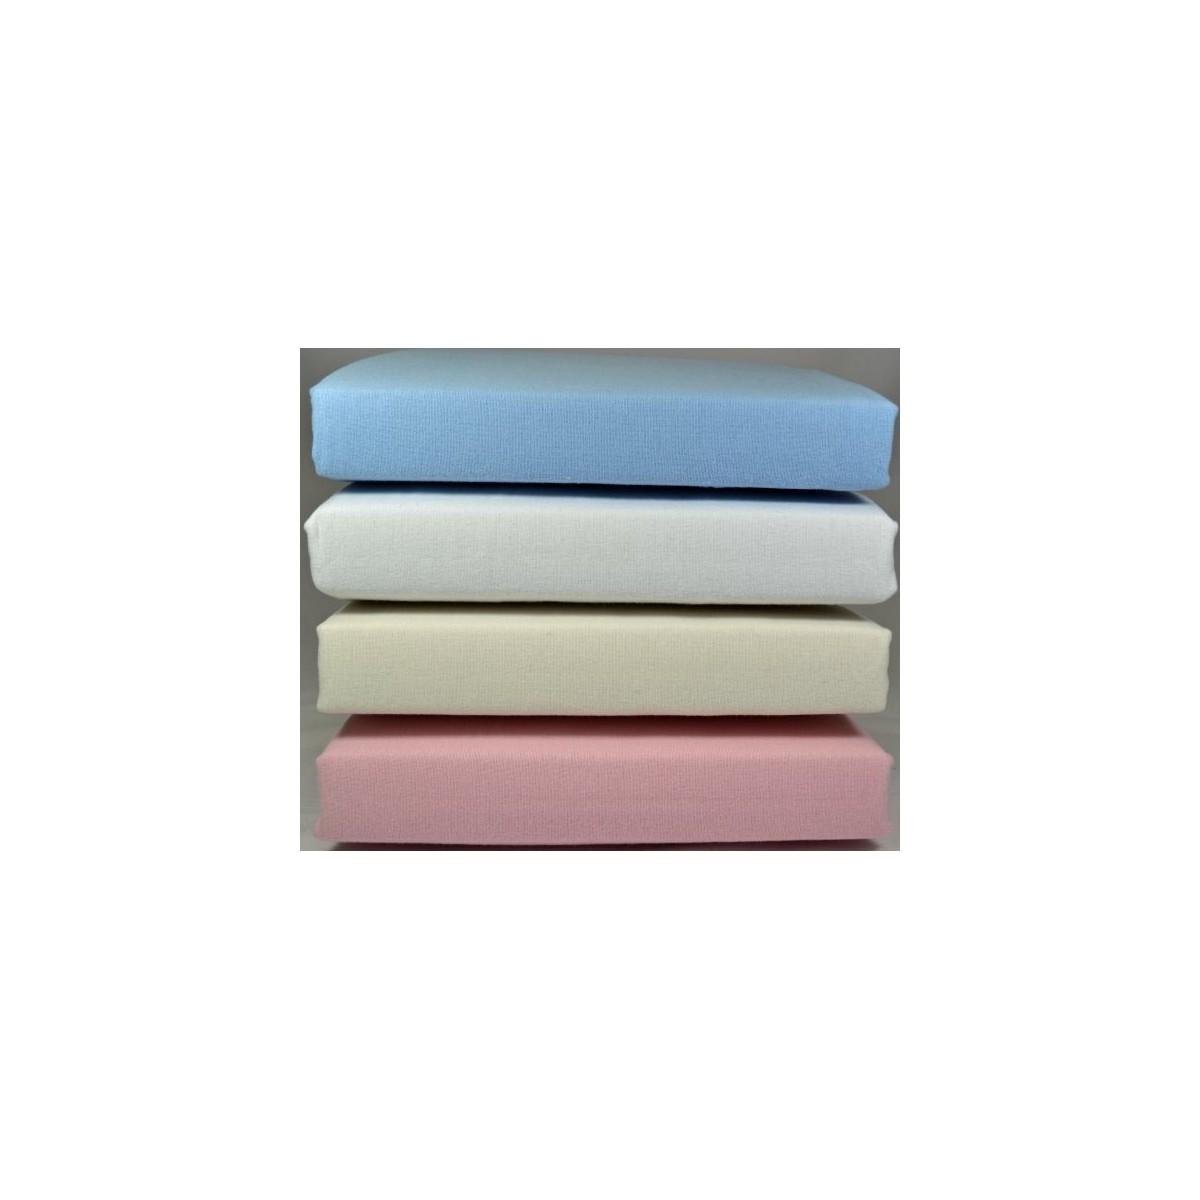 Flanellette Sheets